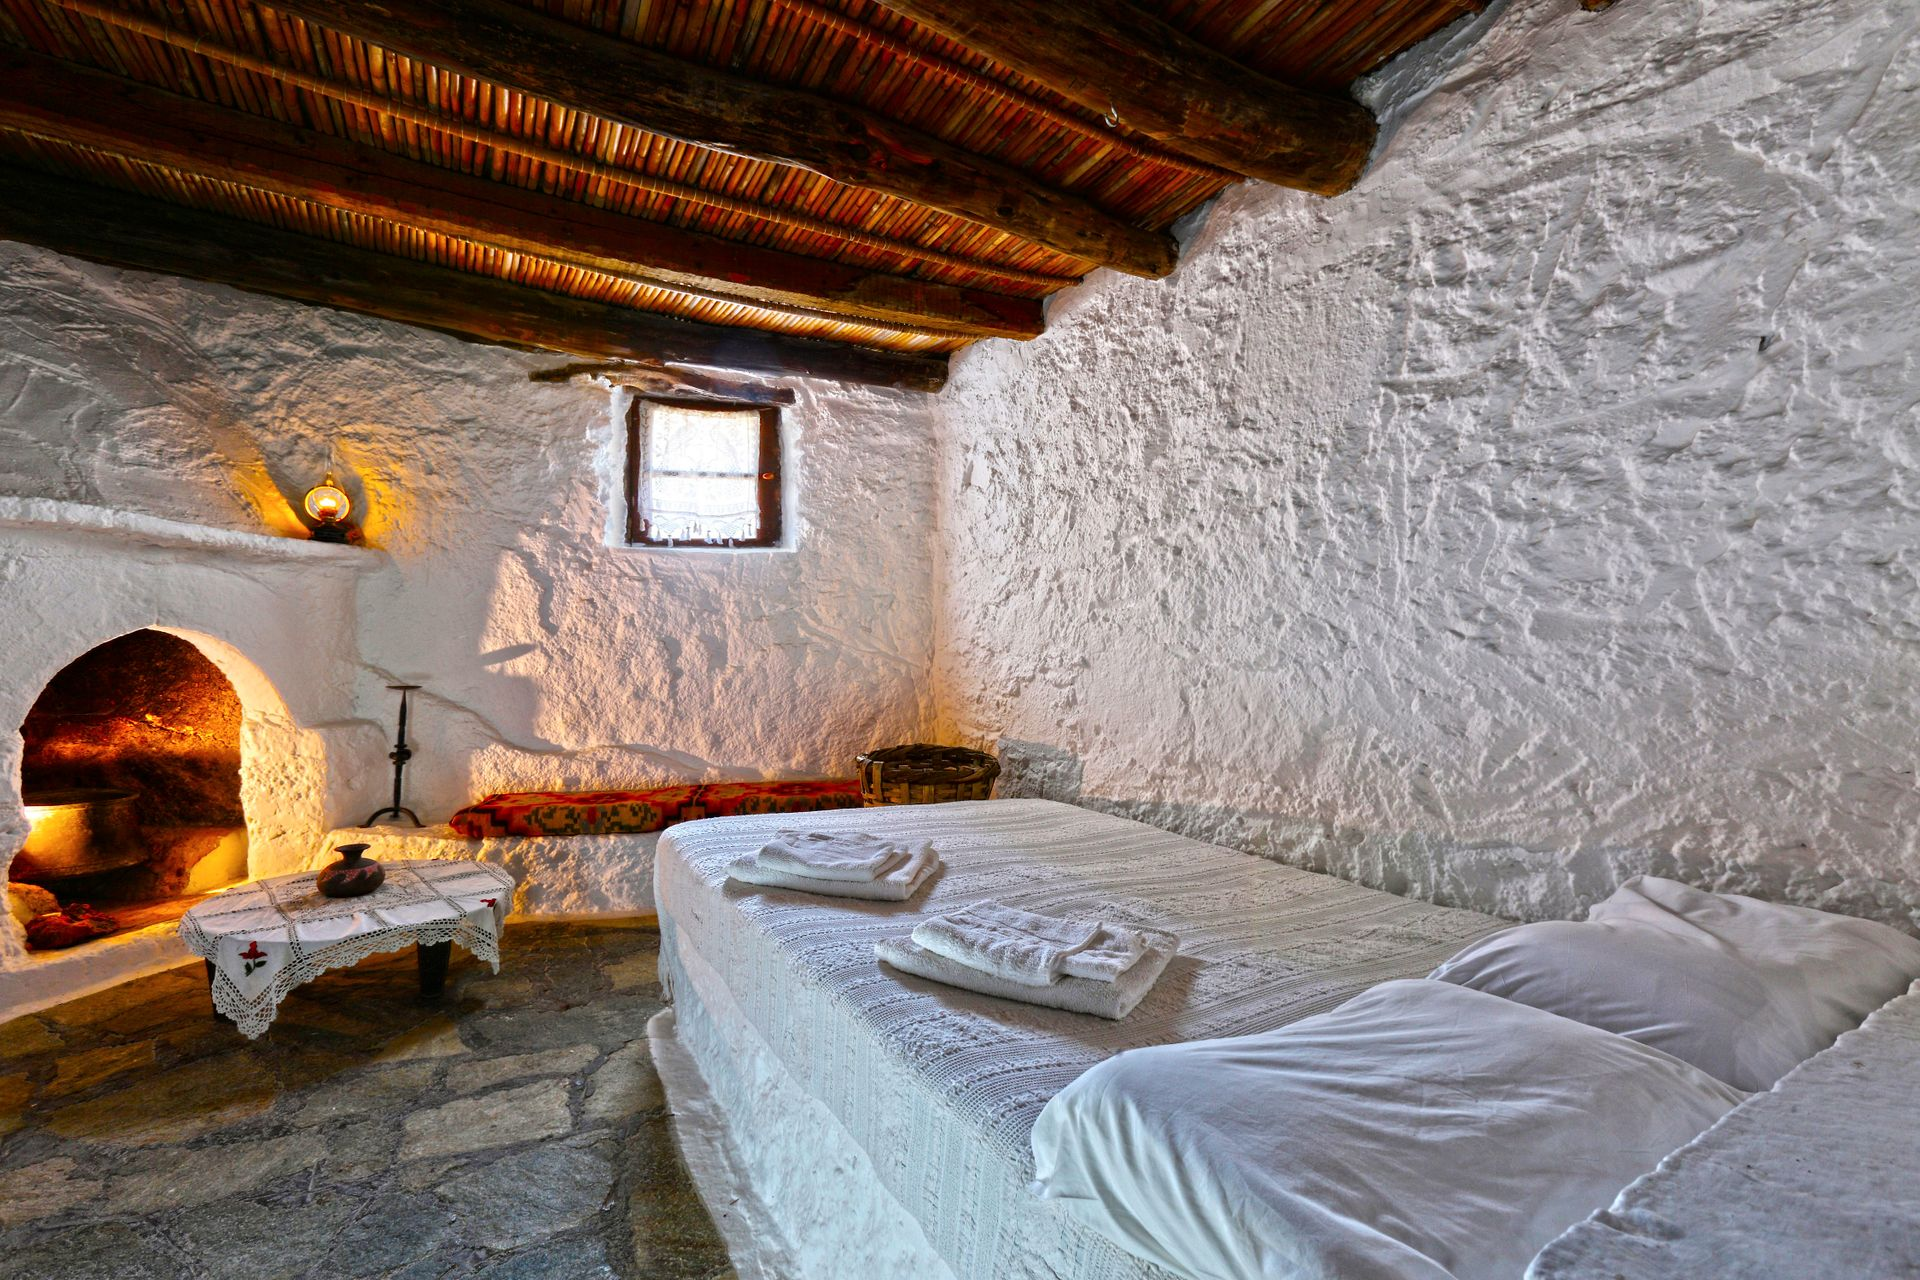 Aspros Potamos Houses - Μακρύς Γιαλός, Κρήτη ✦ 3 Ημέρες (2 Διανυκτερεύσεις) ✦ 2 άτομα ✦ Χωρίς Πρωινό ✦ 01/09/2021 έως 30/09/2021 ✦ Δωρεάν Wi-Fi!